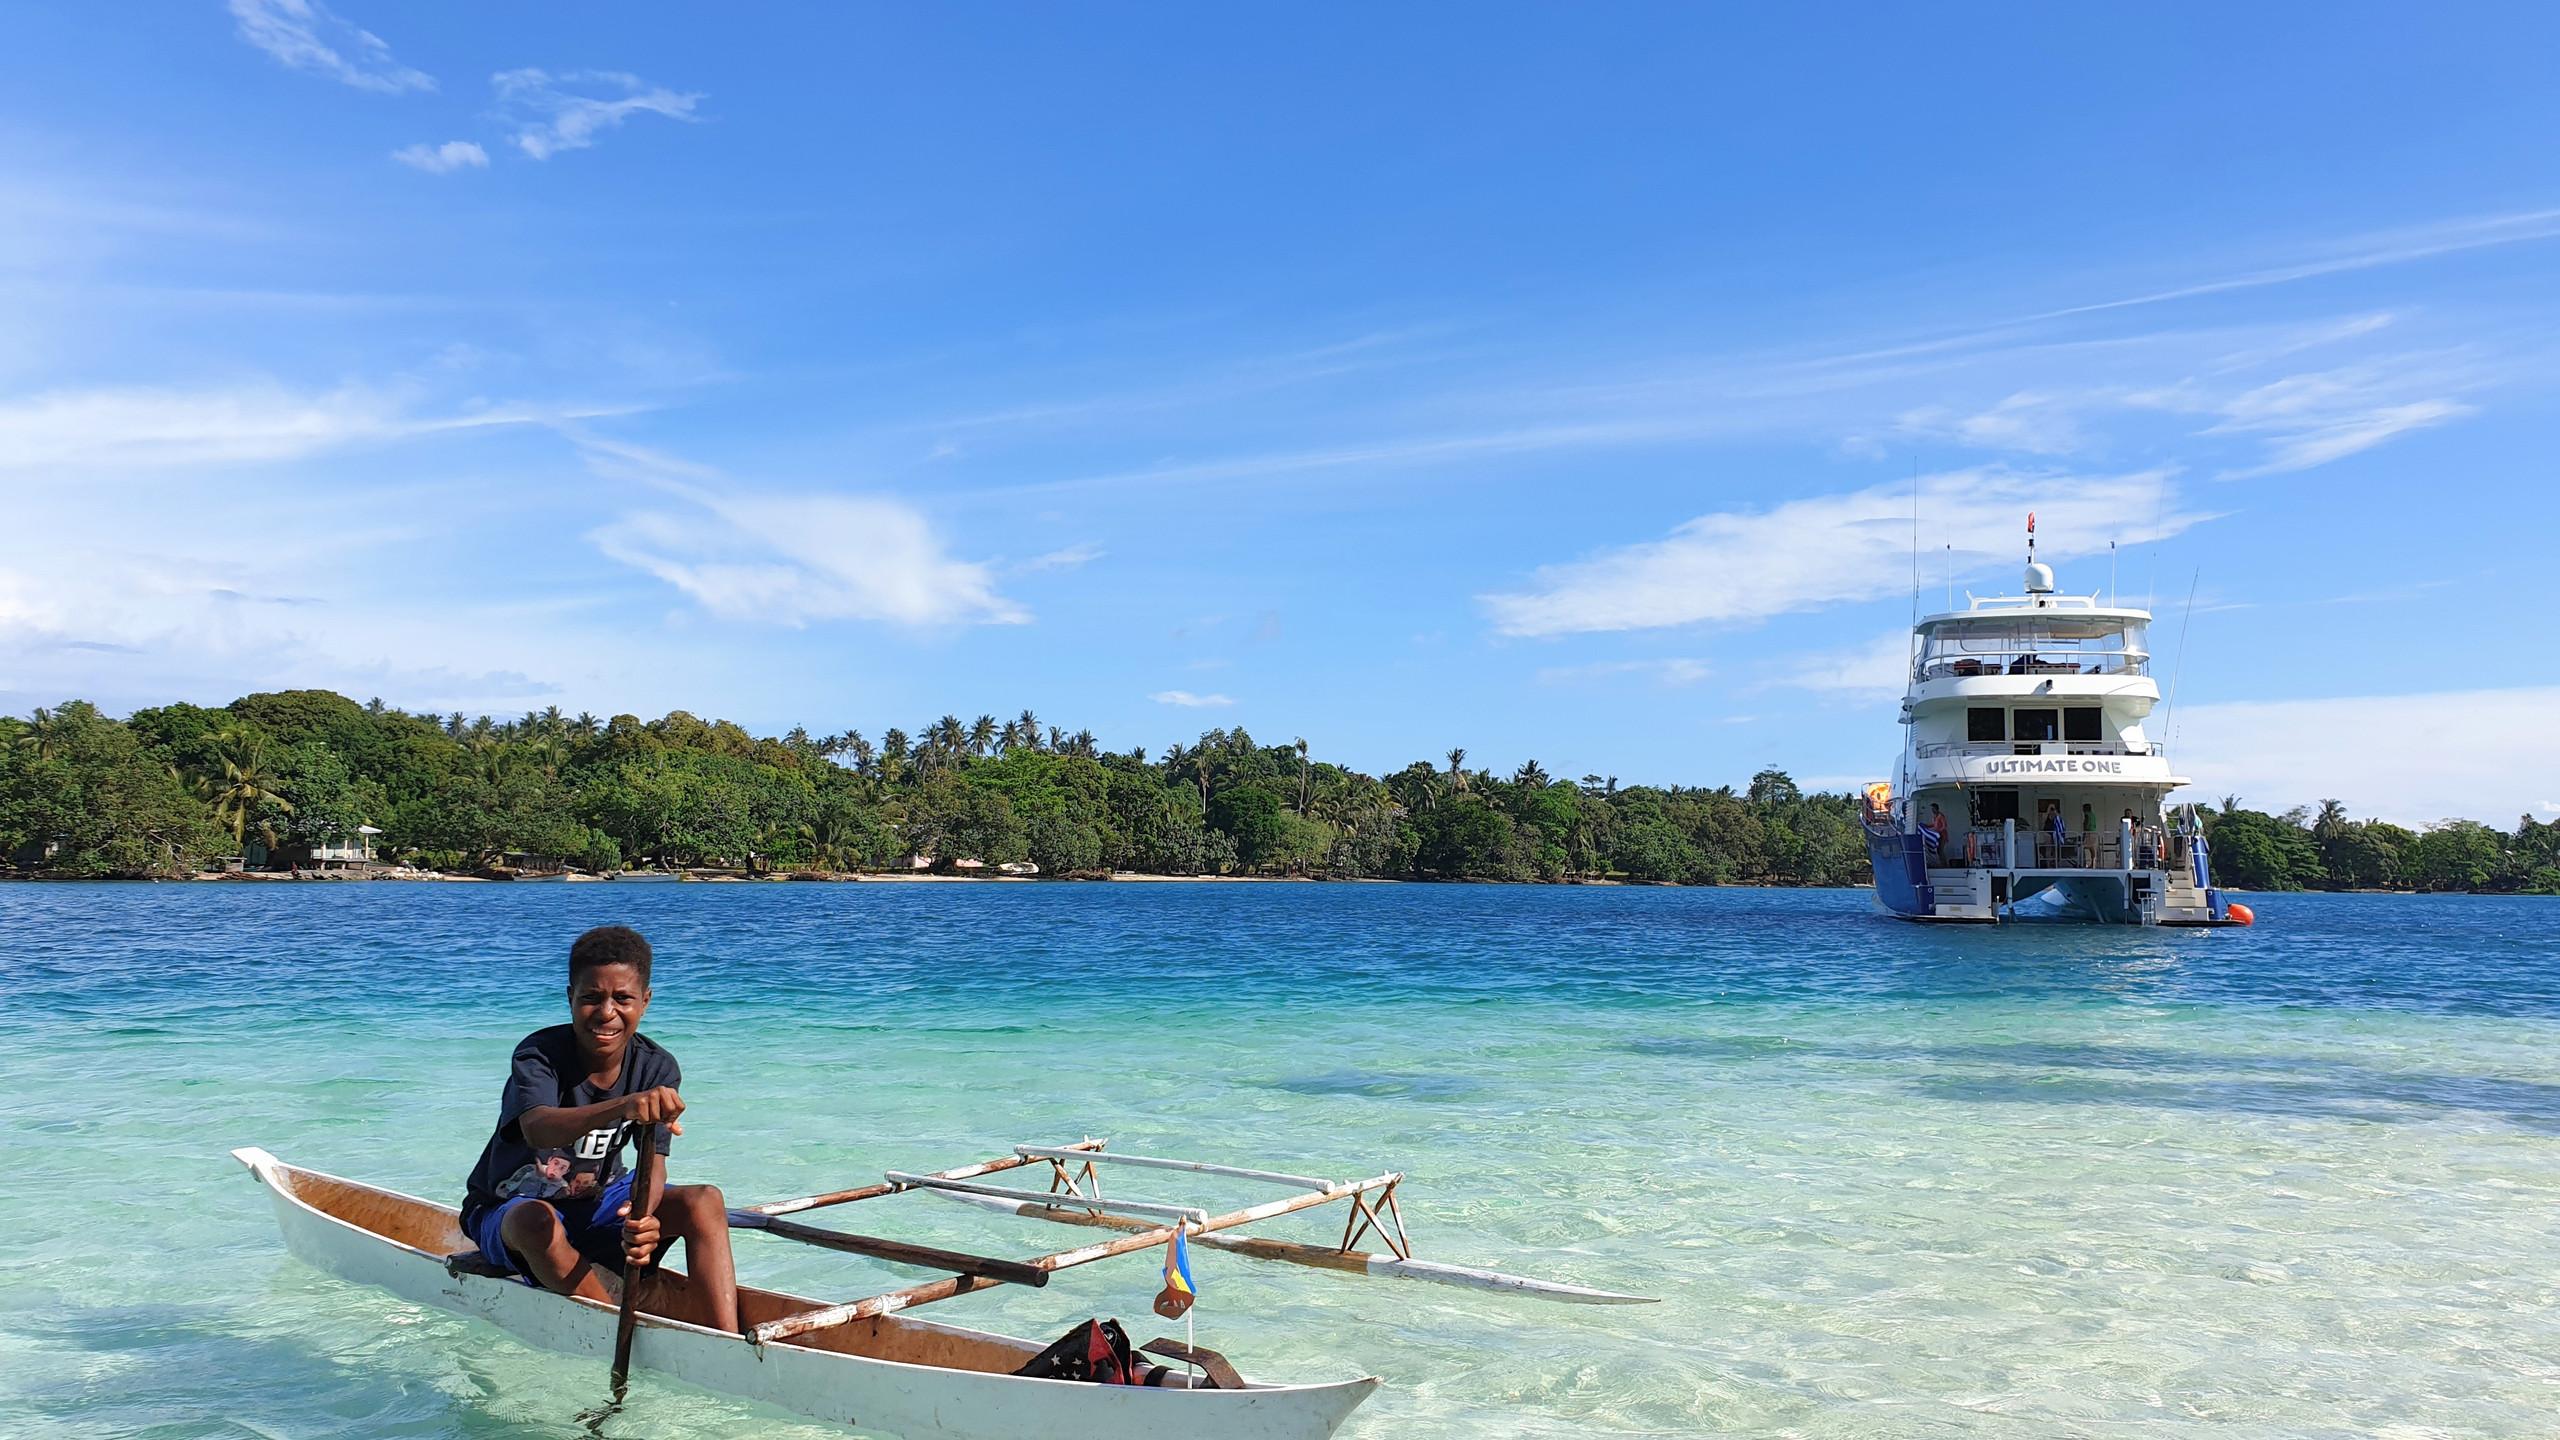 Ultimate One - Duke of York Papua New Guinea